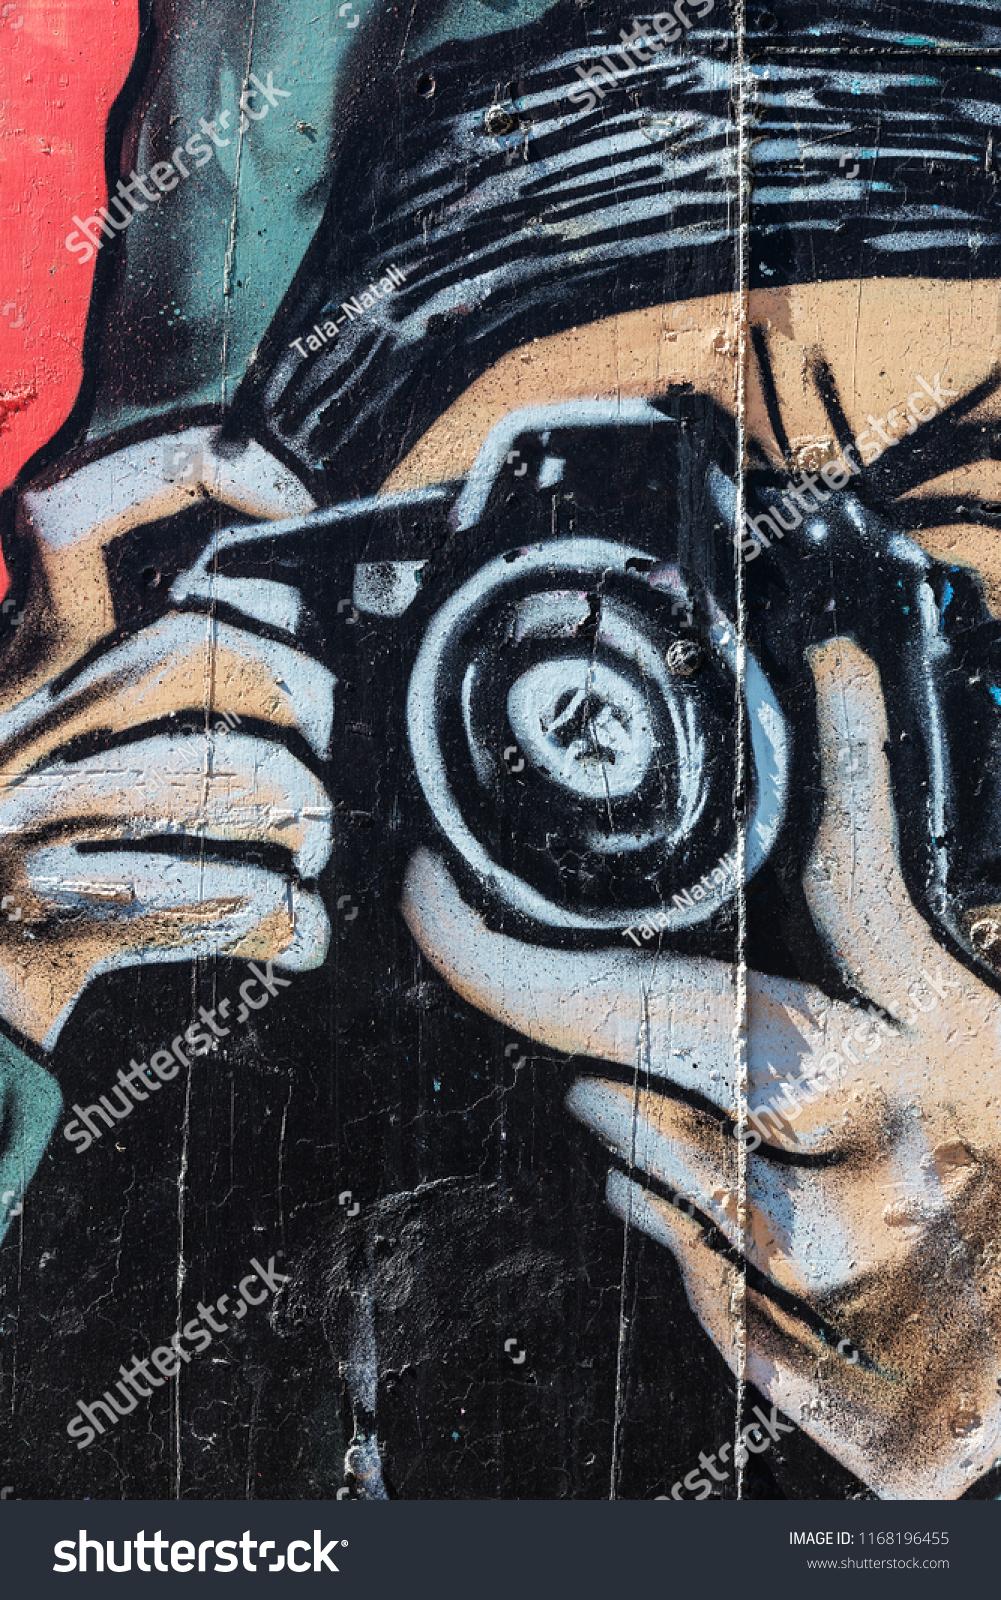 Beautiful Street Art Graffiti Abstract Creative Stock Photo